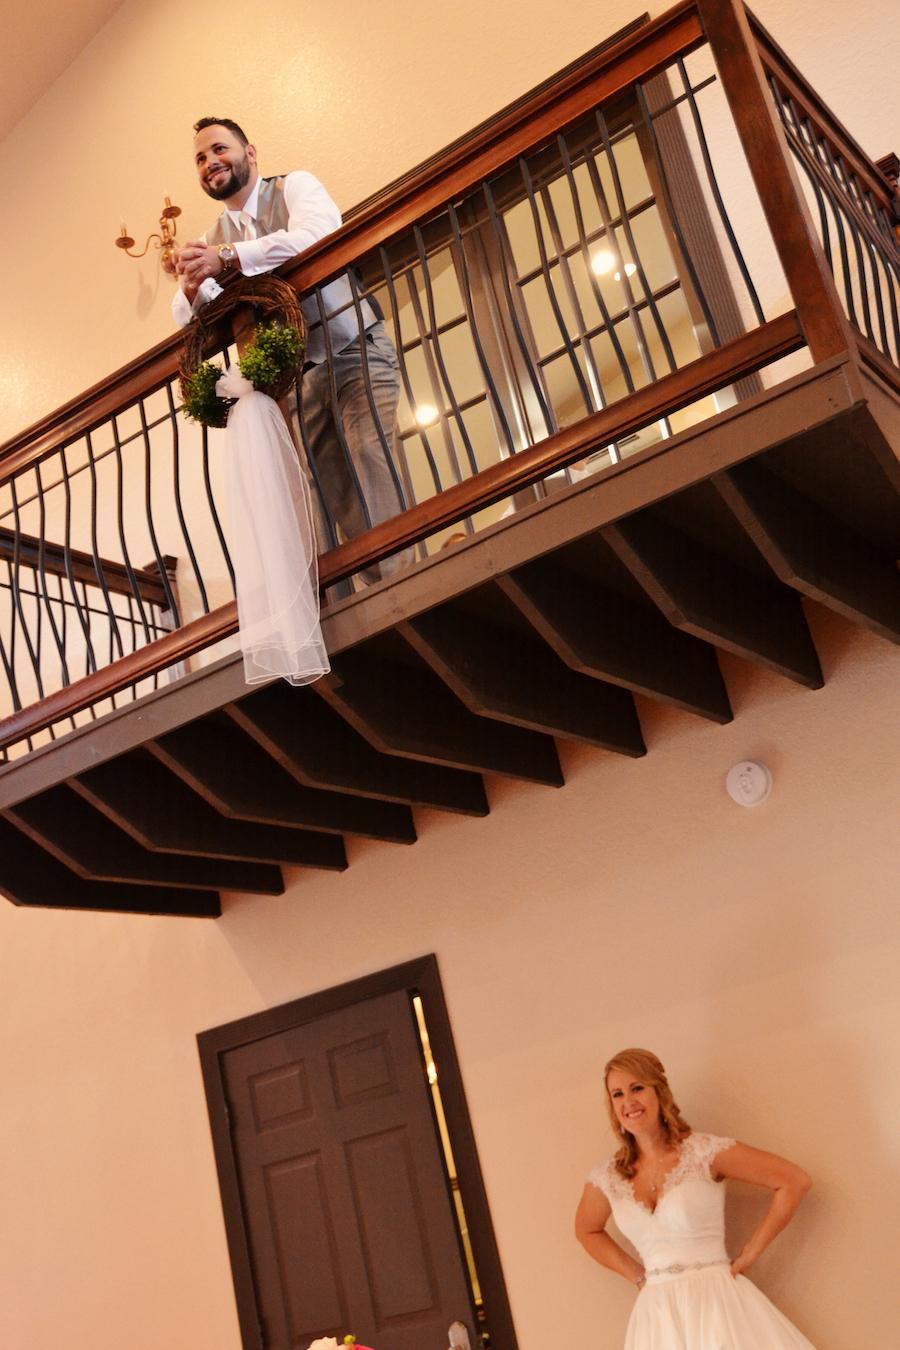 Sarasota Bride and Groom First Look on Wedding Day   Sarasota Wedding Venue Bakers Ranch